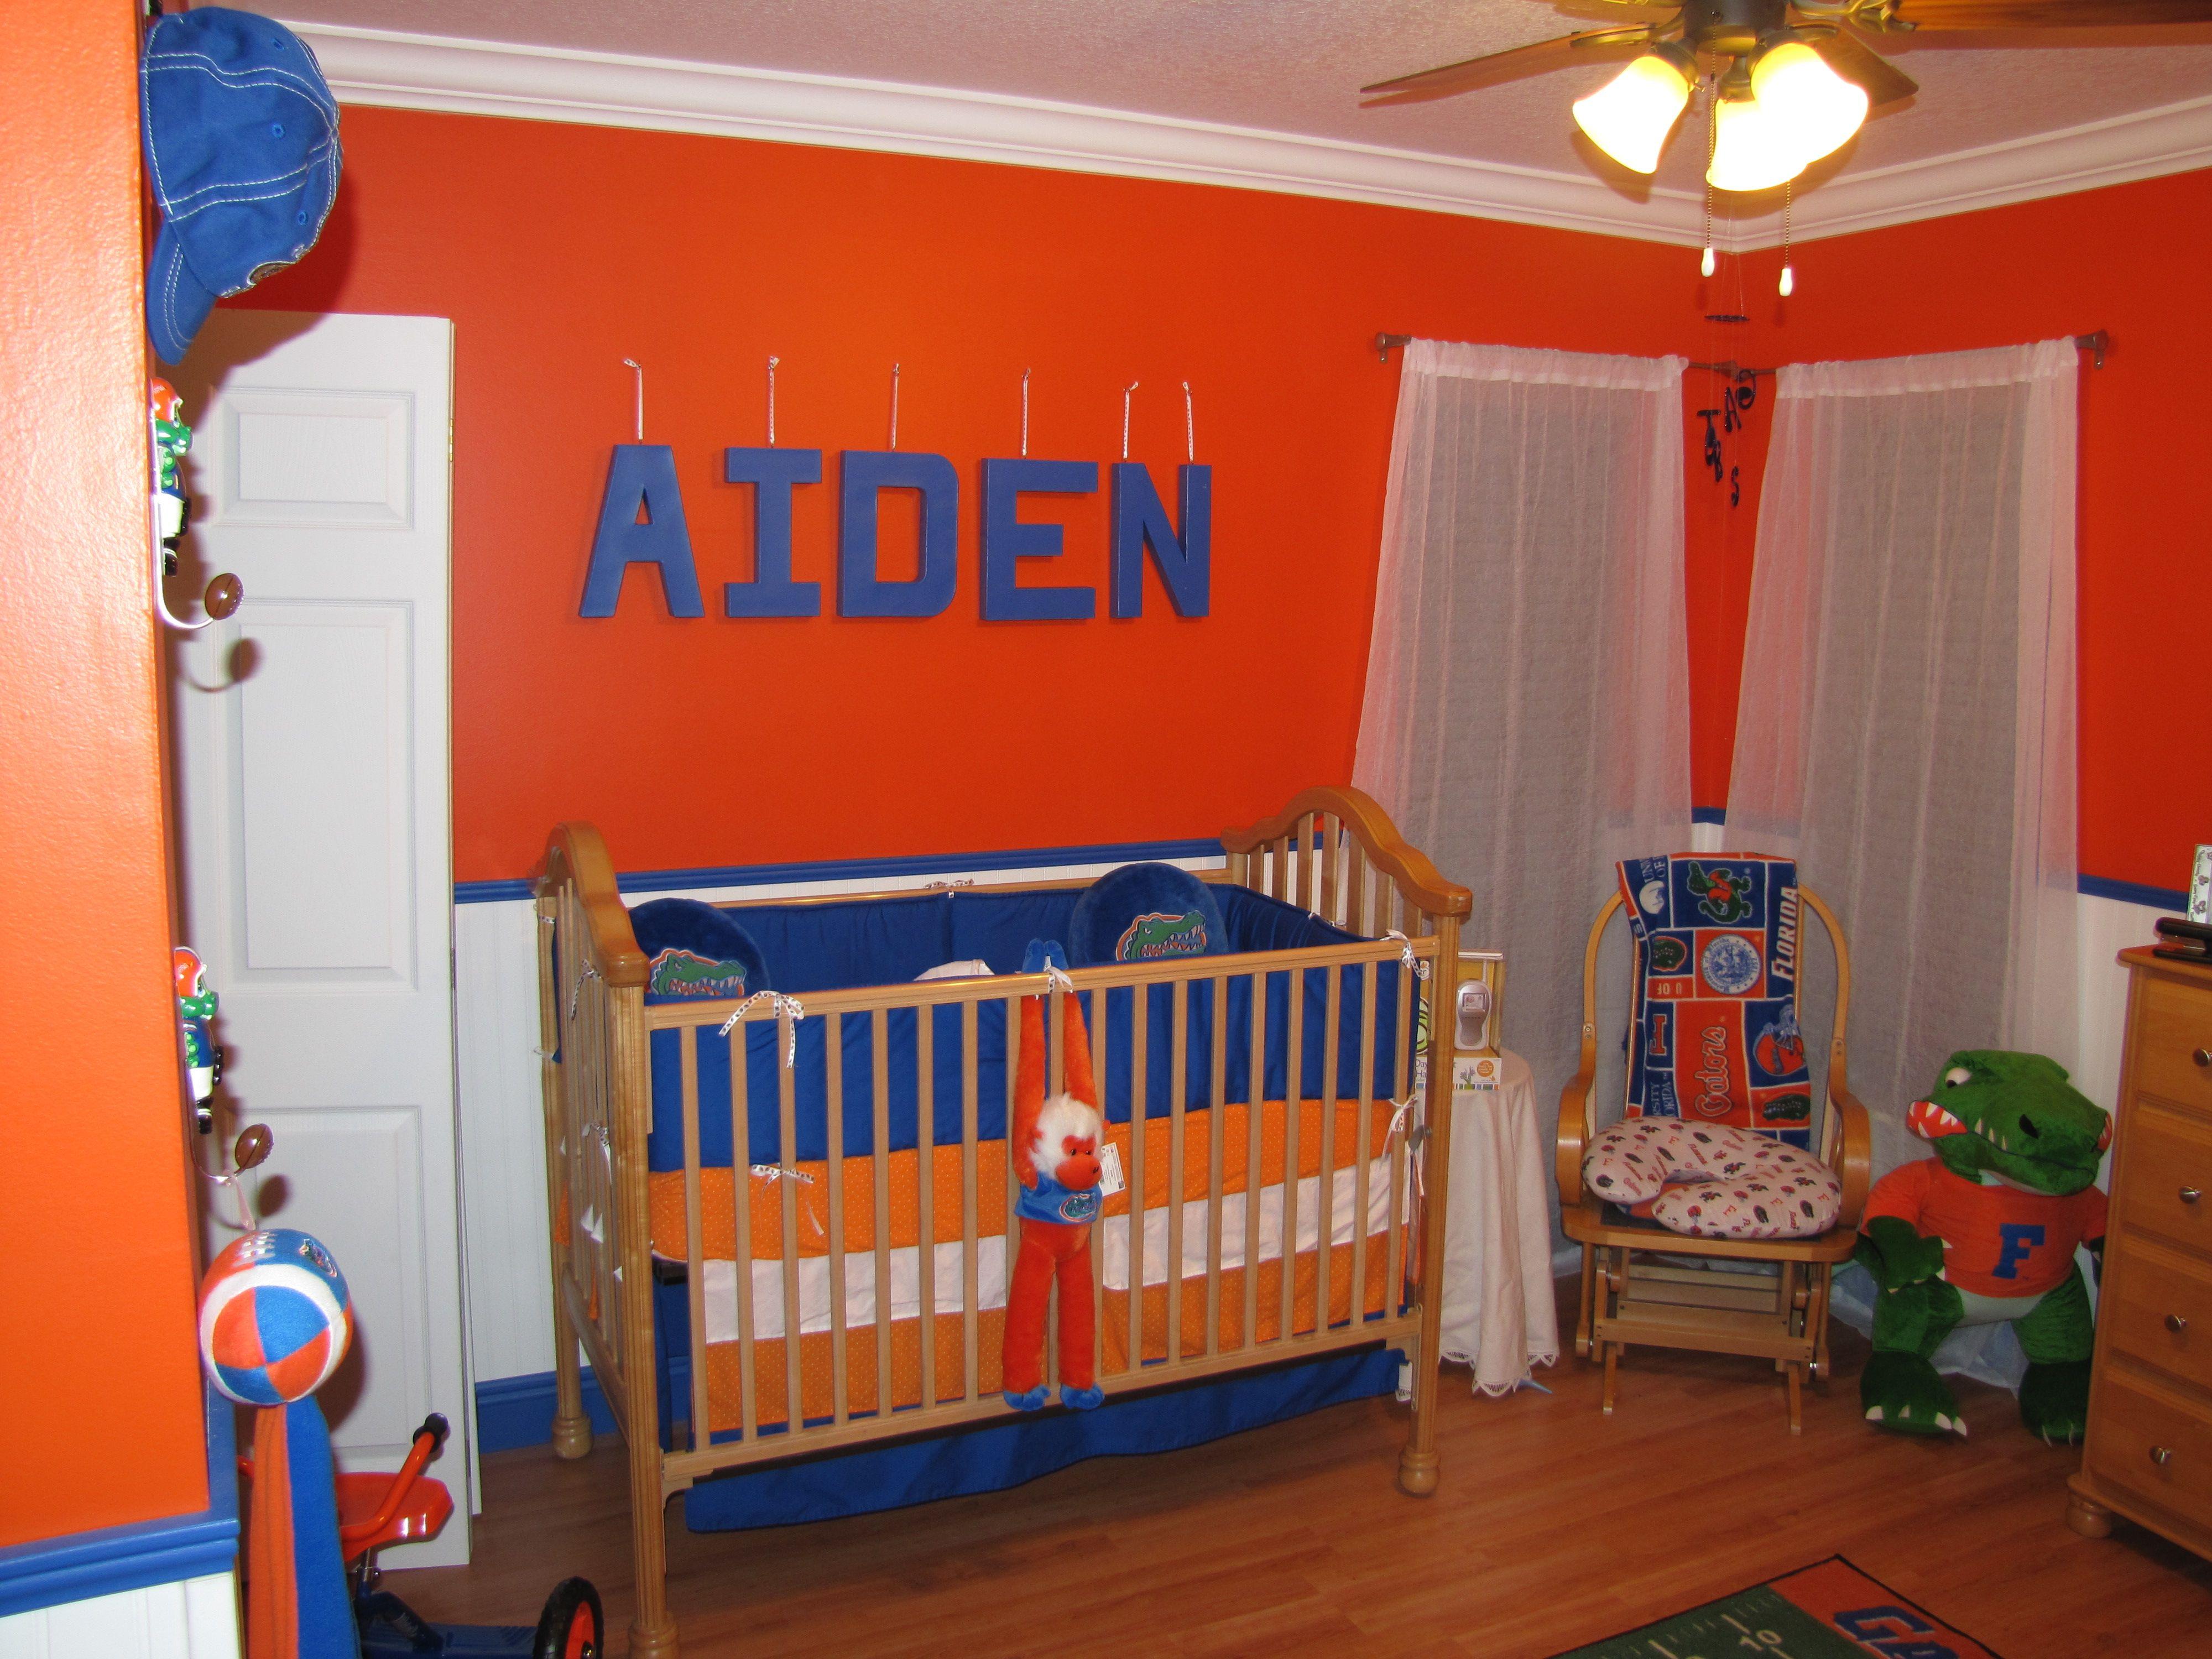 Aidenu0027s Florida Gator Nursery